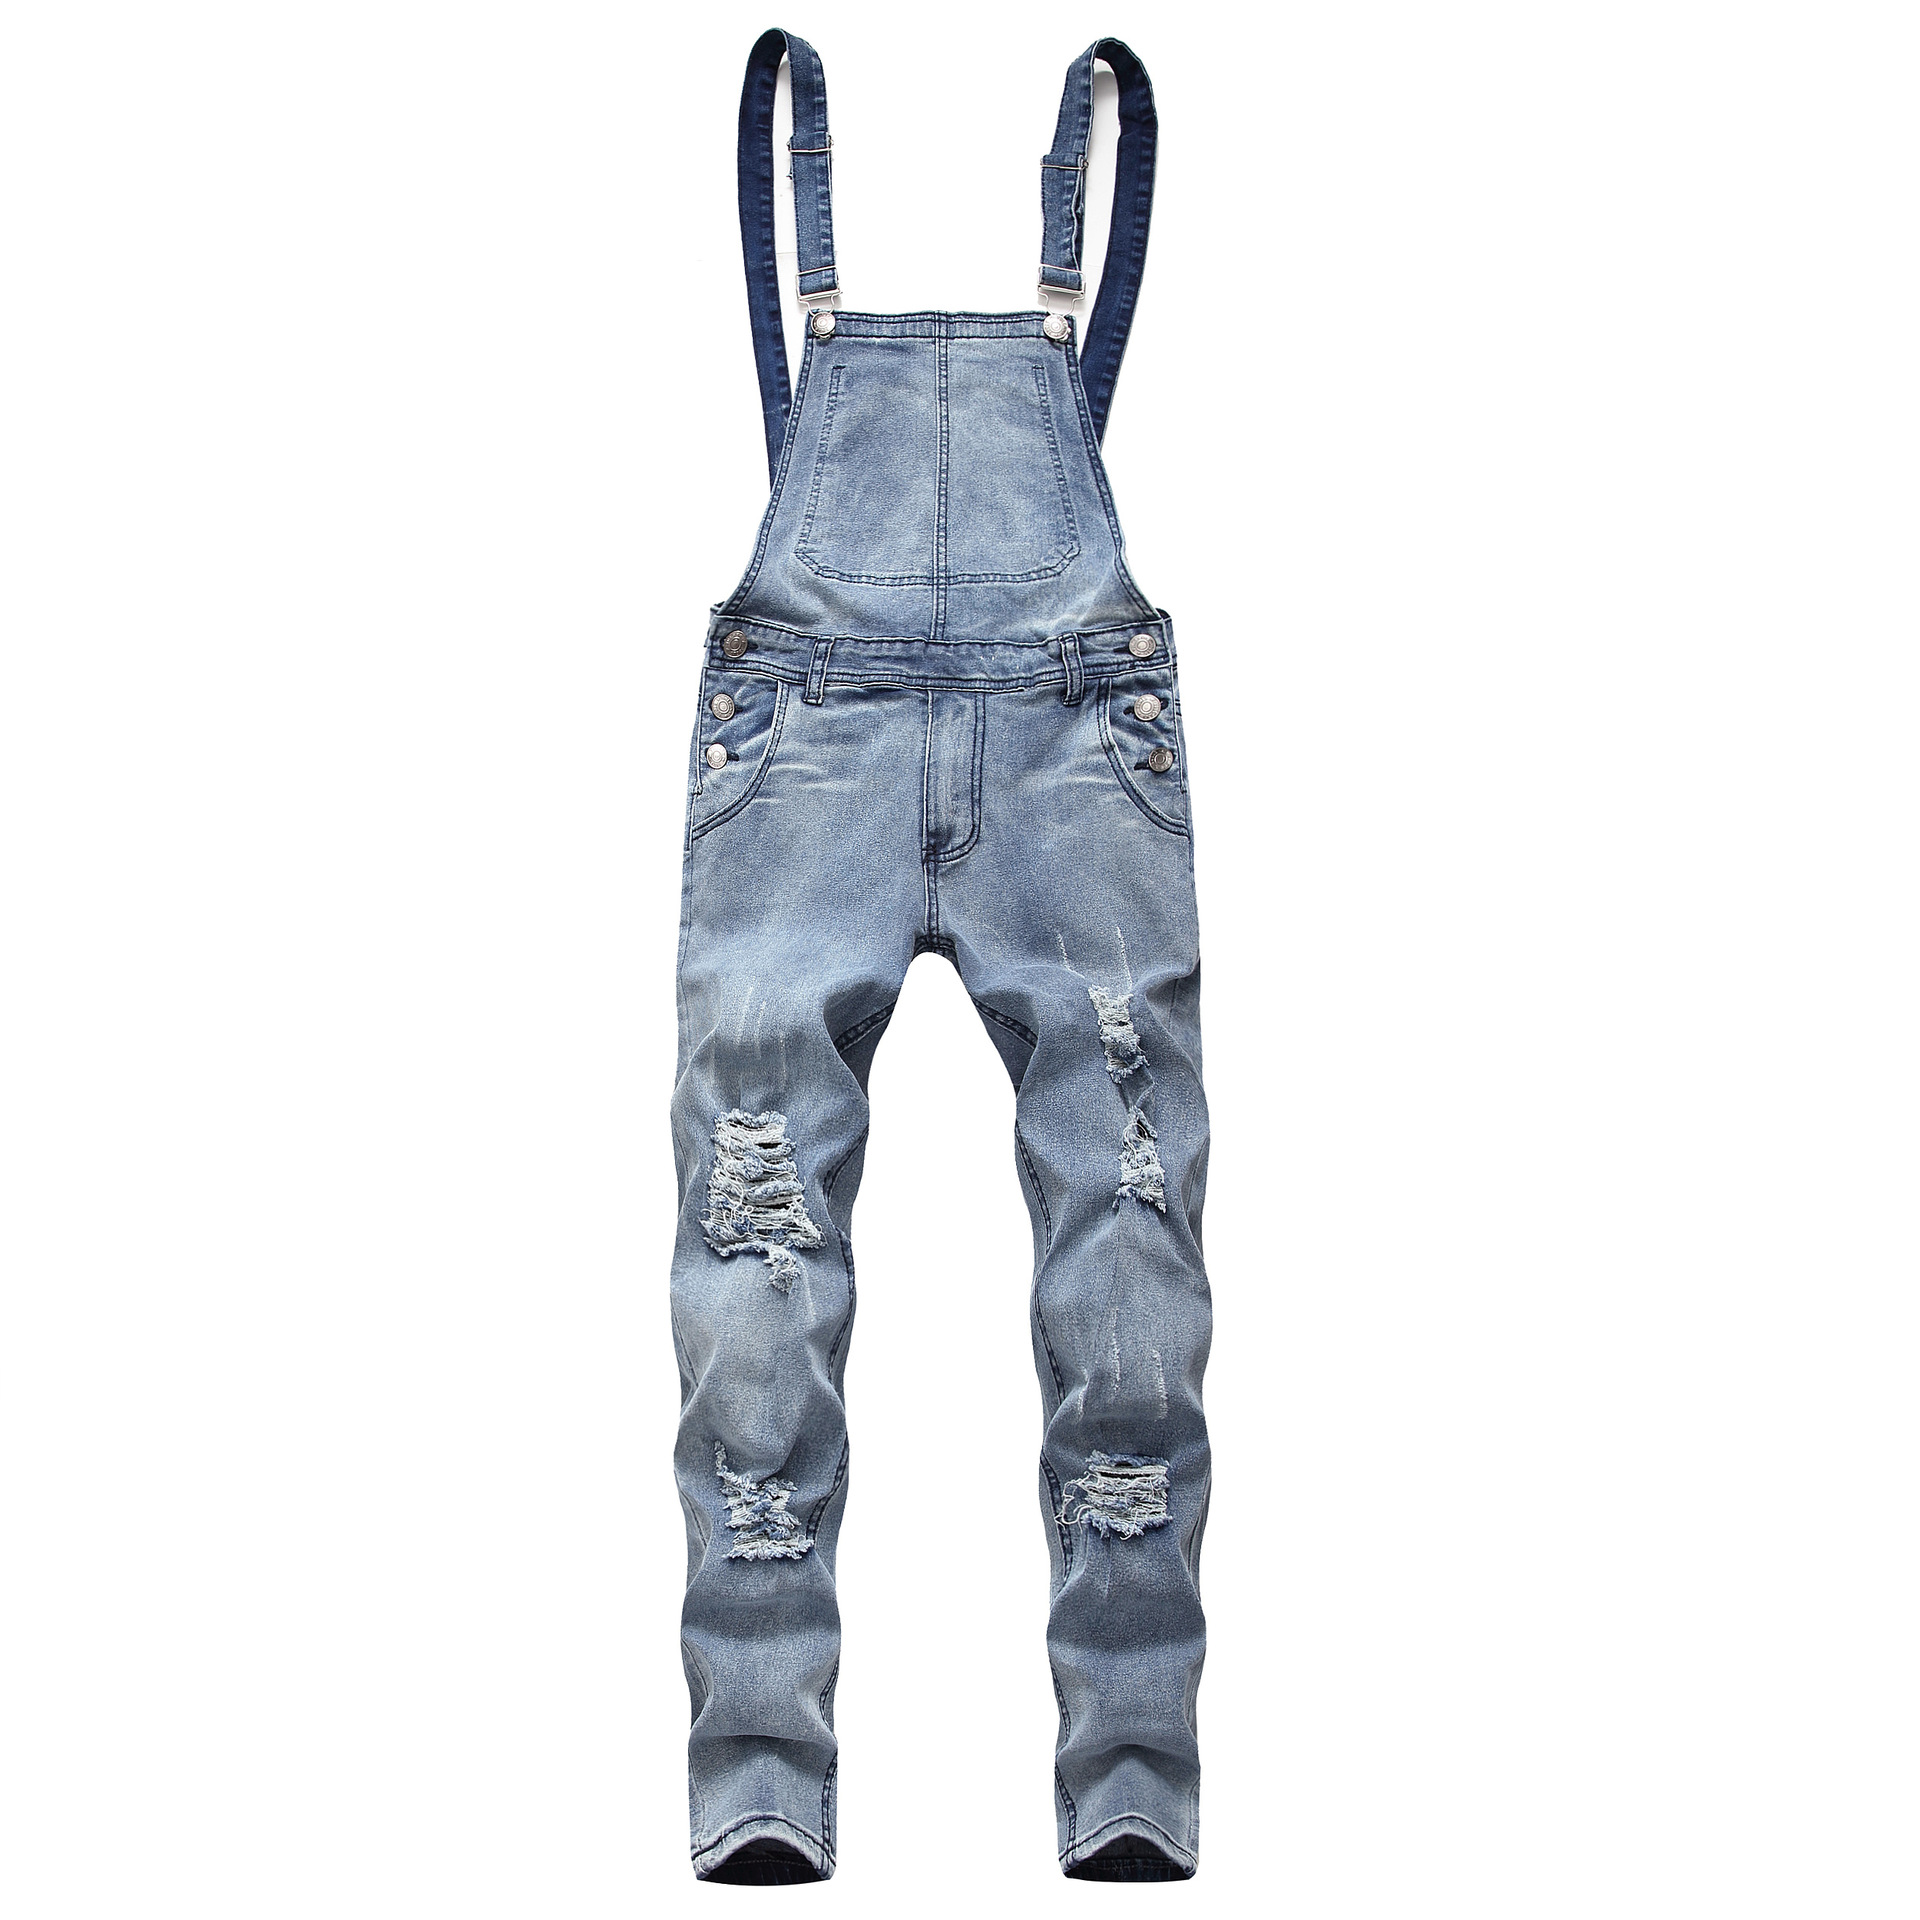 Men's Denim Jumper Pants Men's Casual Slim Clothing Jeans New Style Pants Streetwear Biker Patch Hole Ripped Skinny Jeans